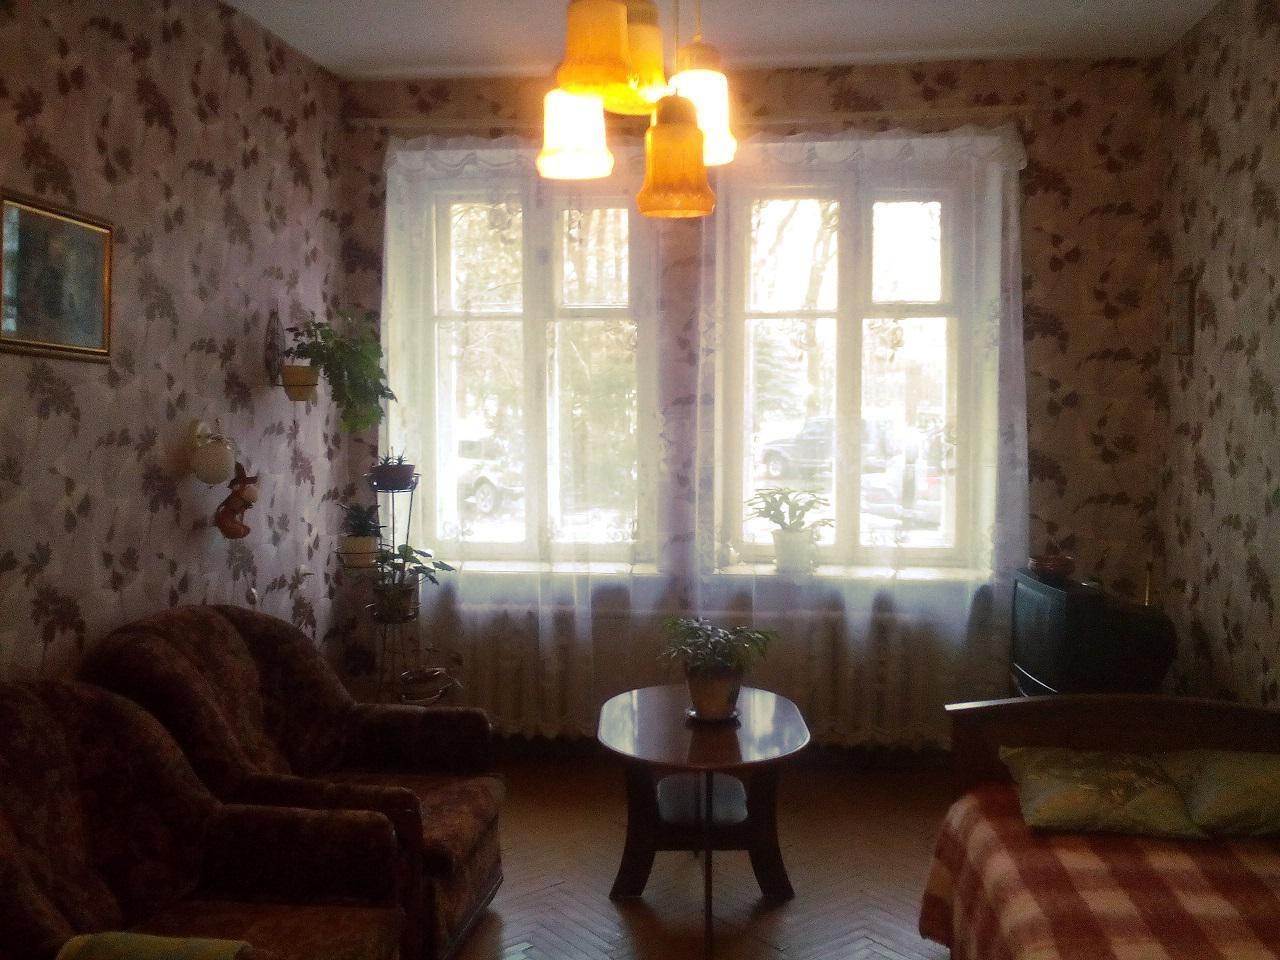 Комната, купить комнату в квартире клина недорого, id объекта - 700612530 - фото 2